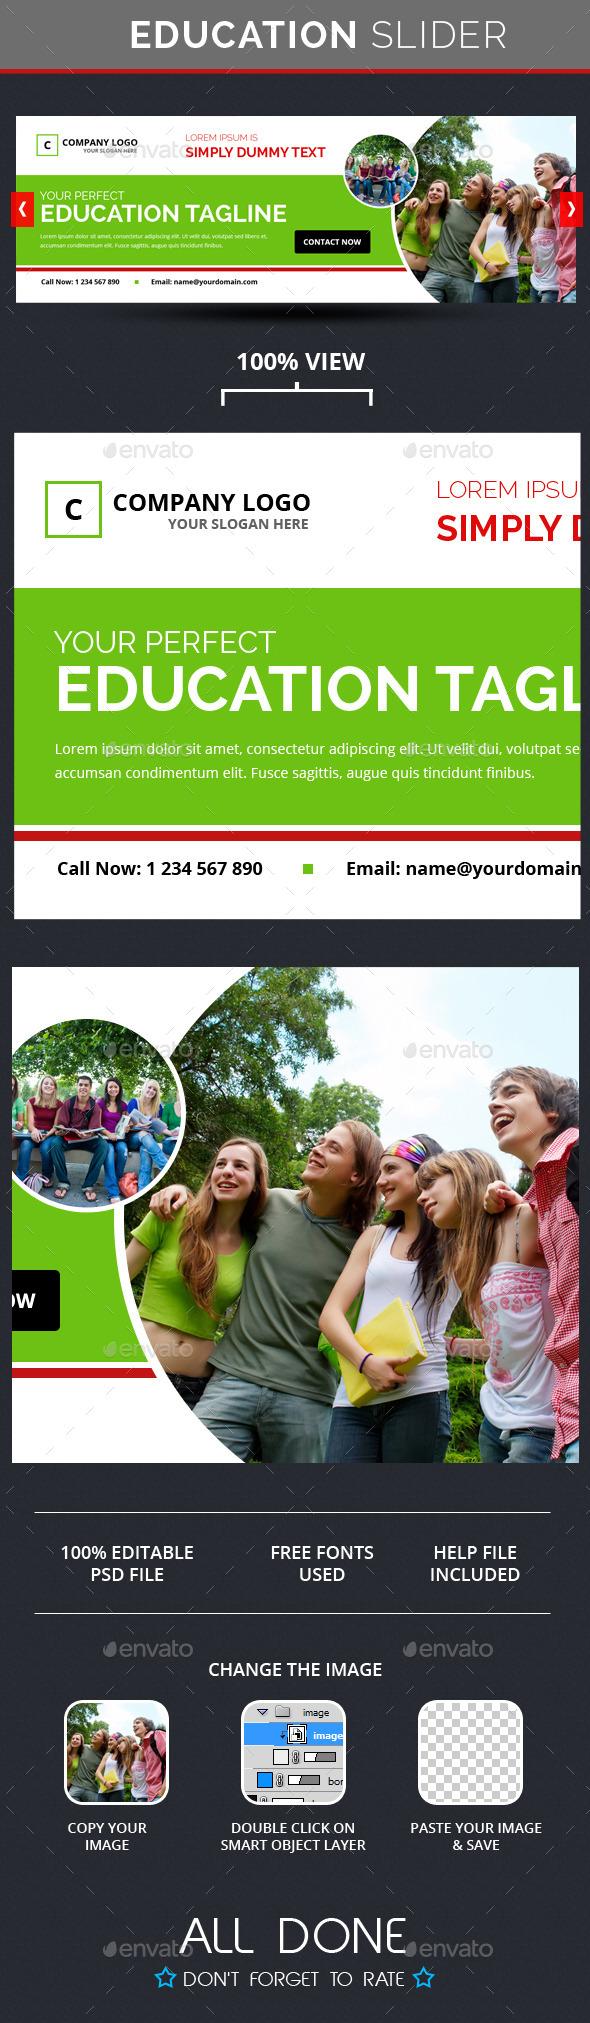 GraphicRiver Education Slider 10638174